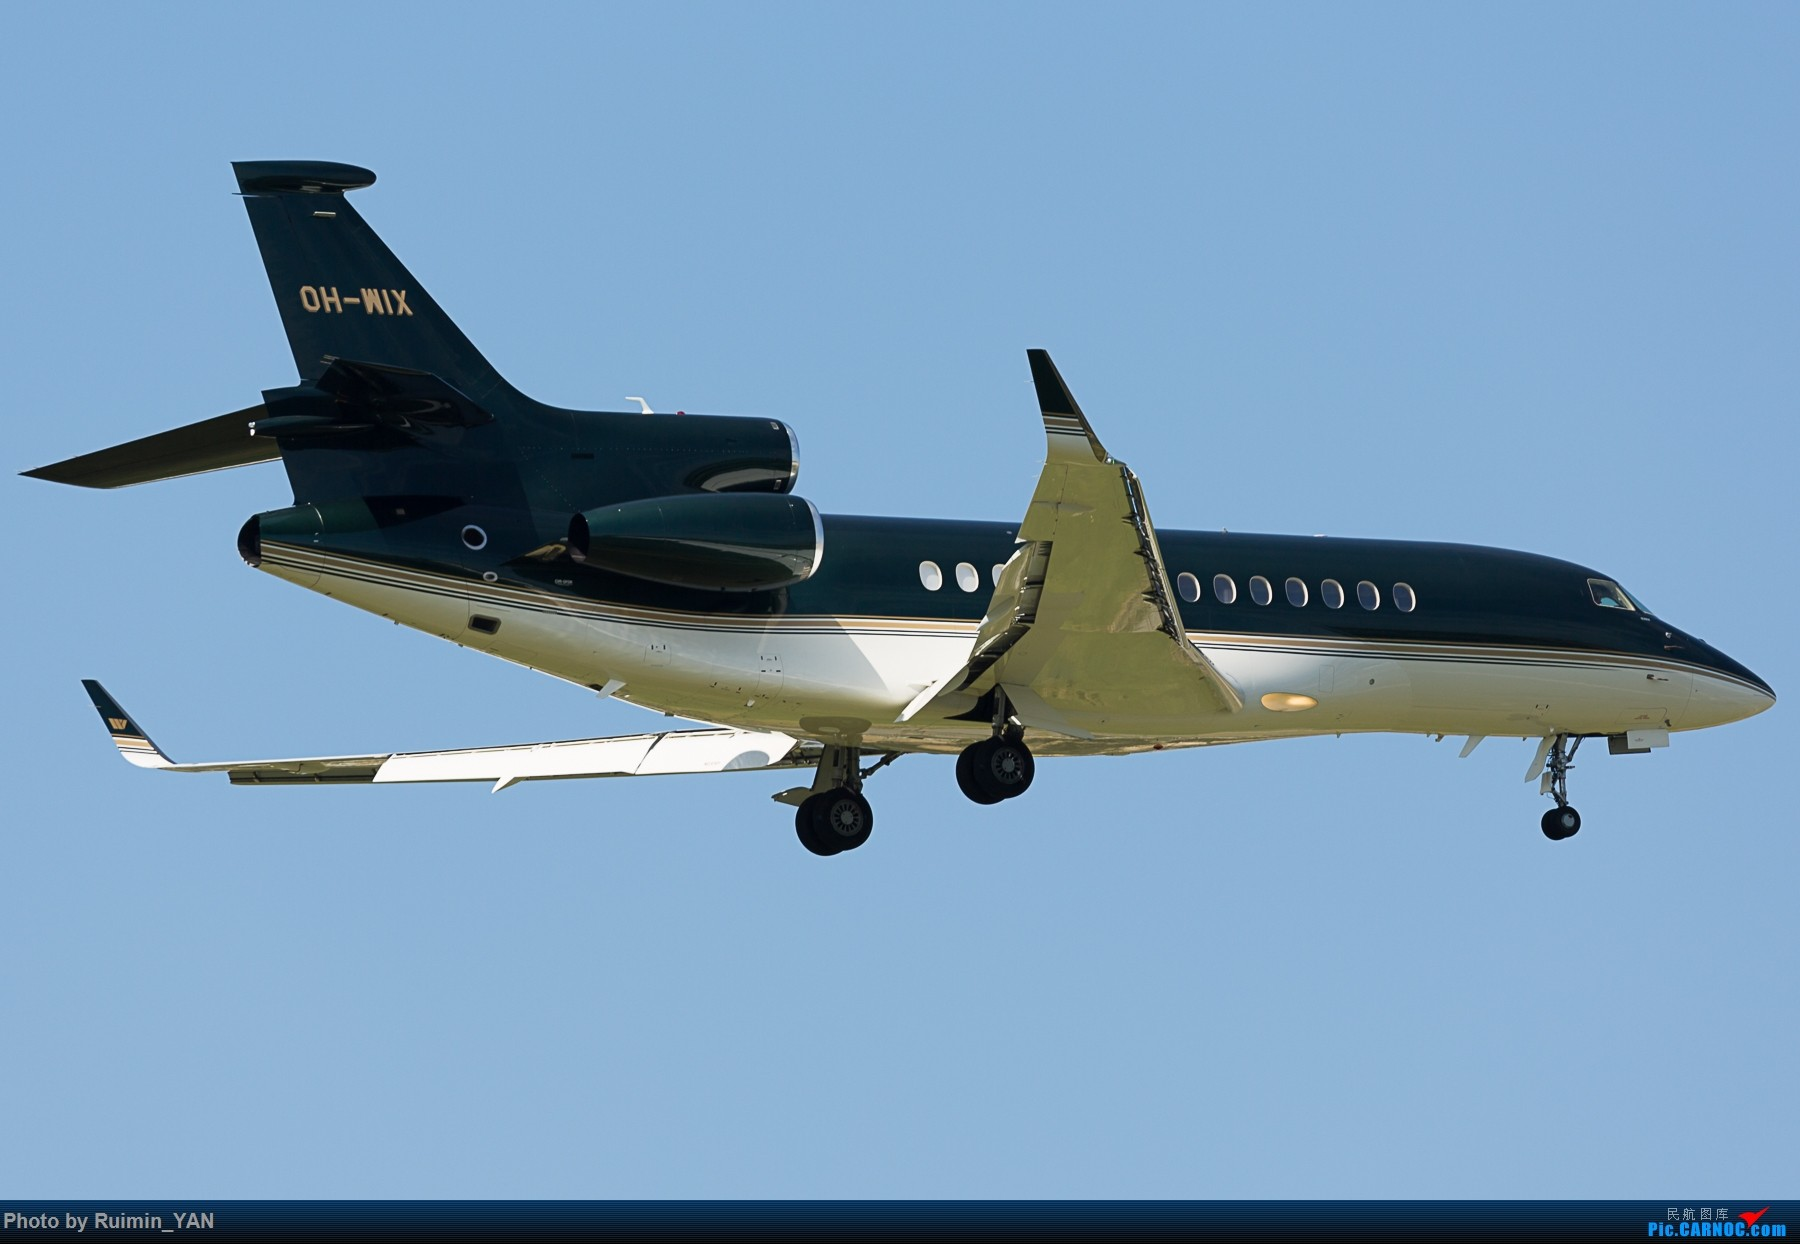 Re:[原创]【PEK】【砖机】【公务机】未知领导访华 Jetflite OH-WIX Dassault Falcon 7X DASSAULT FALCON 7X OH-WIX 中国北京首都国际机场